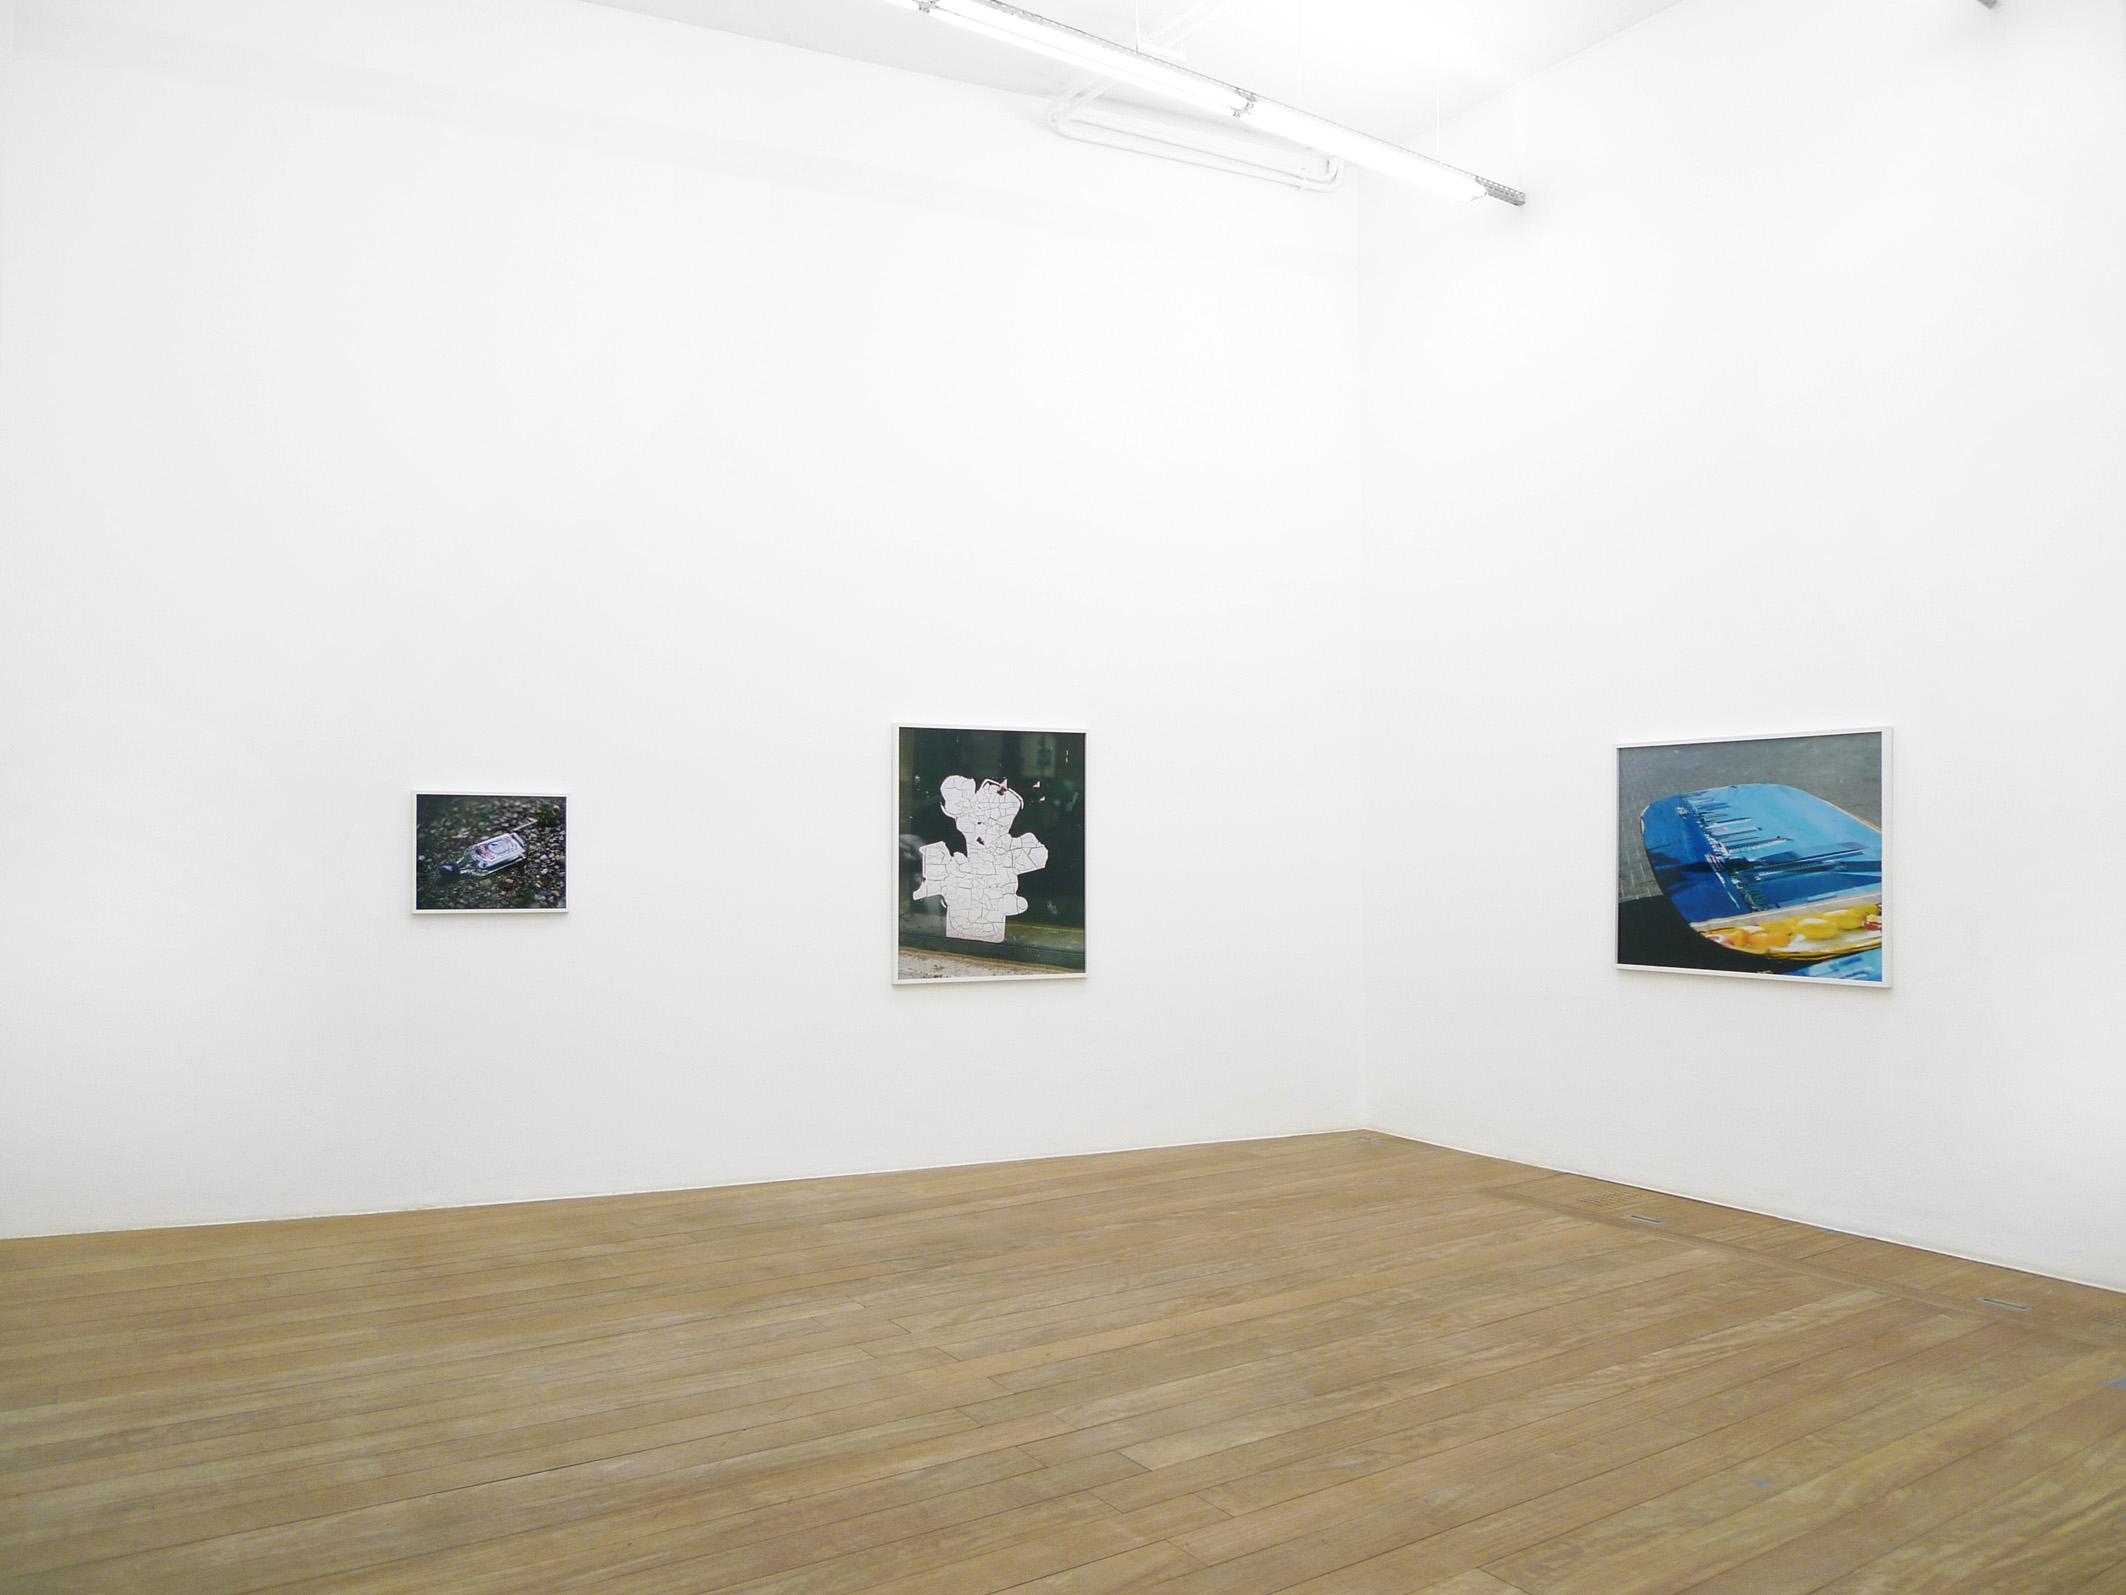 Sioule et caetera, 2013